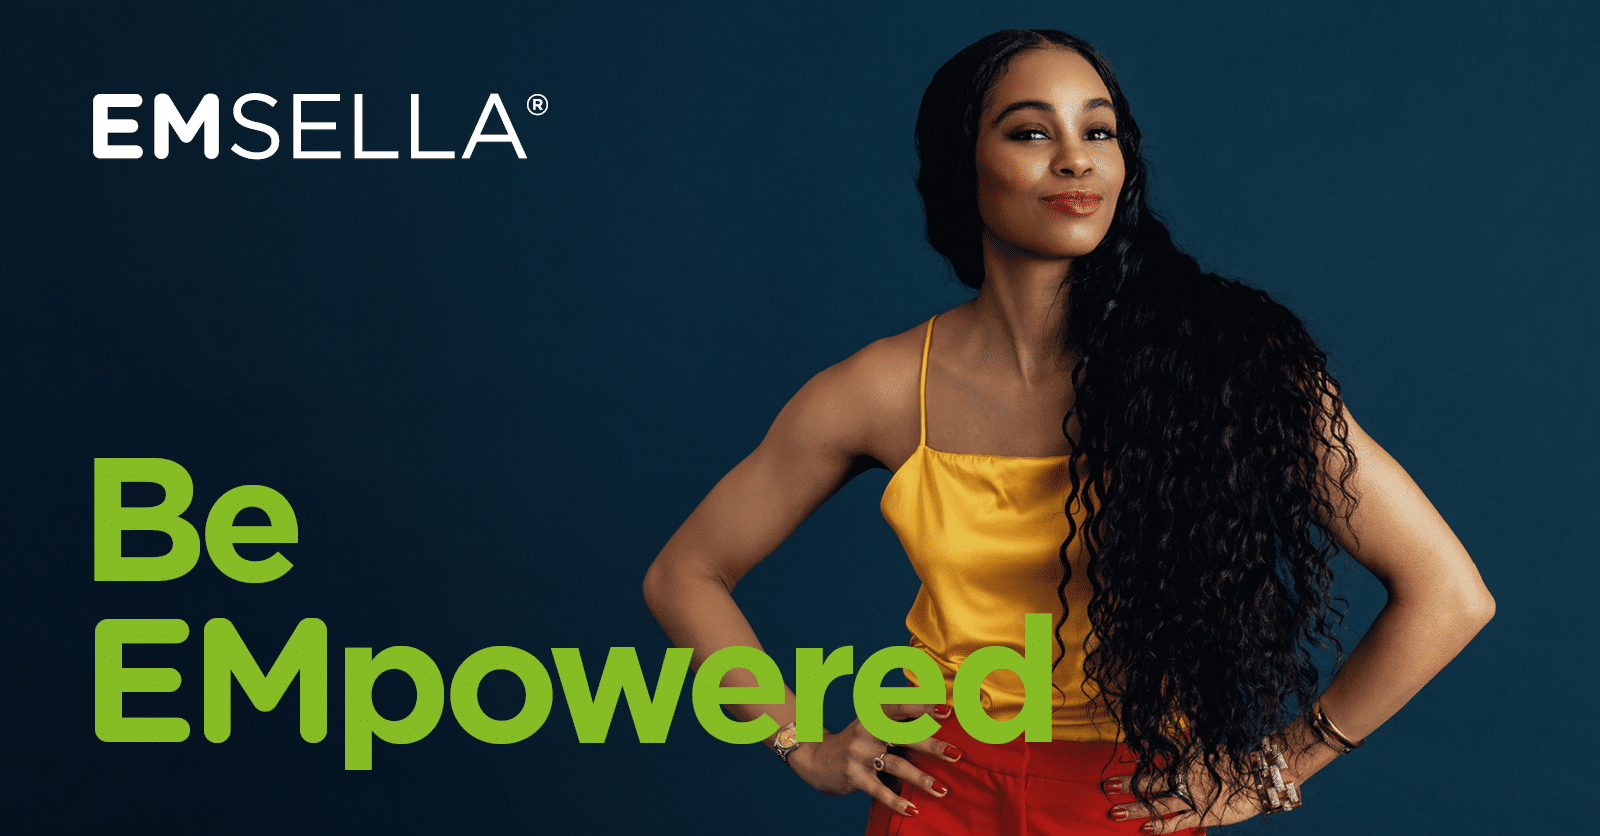 Emsella - Be Empowered